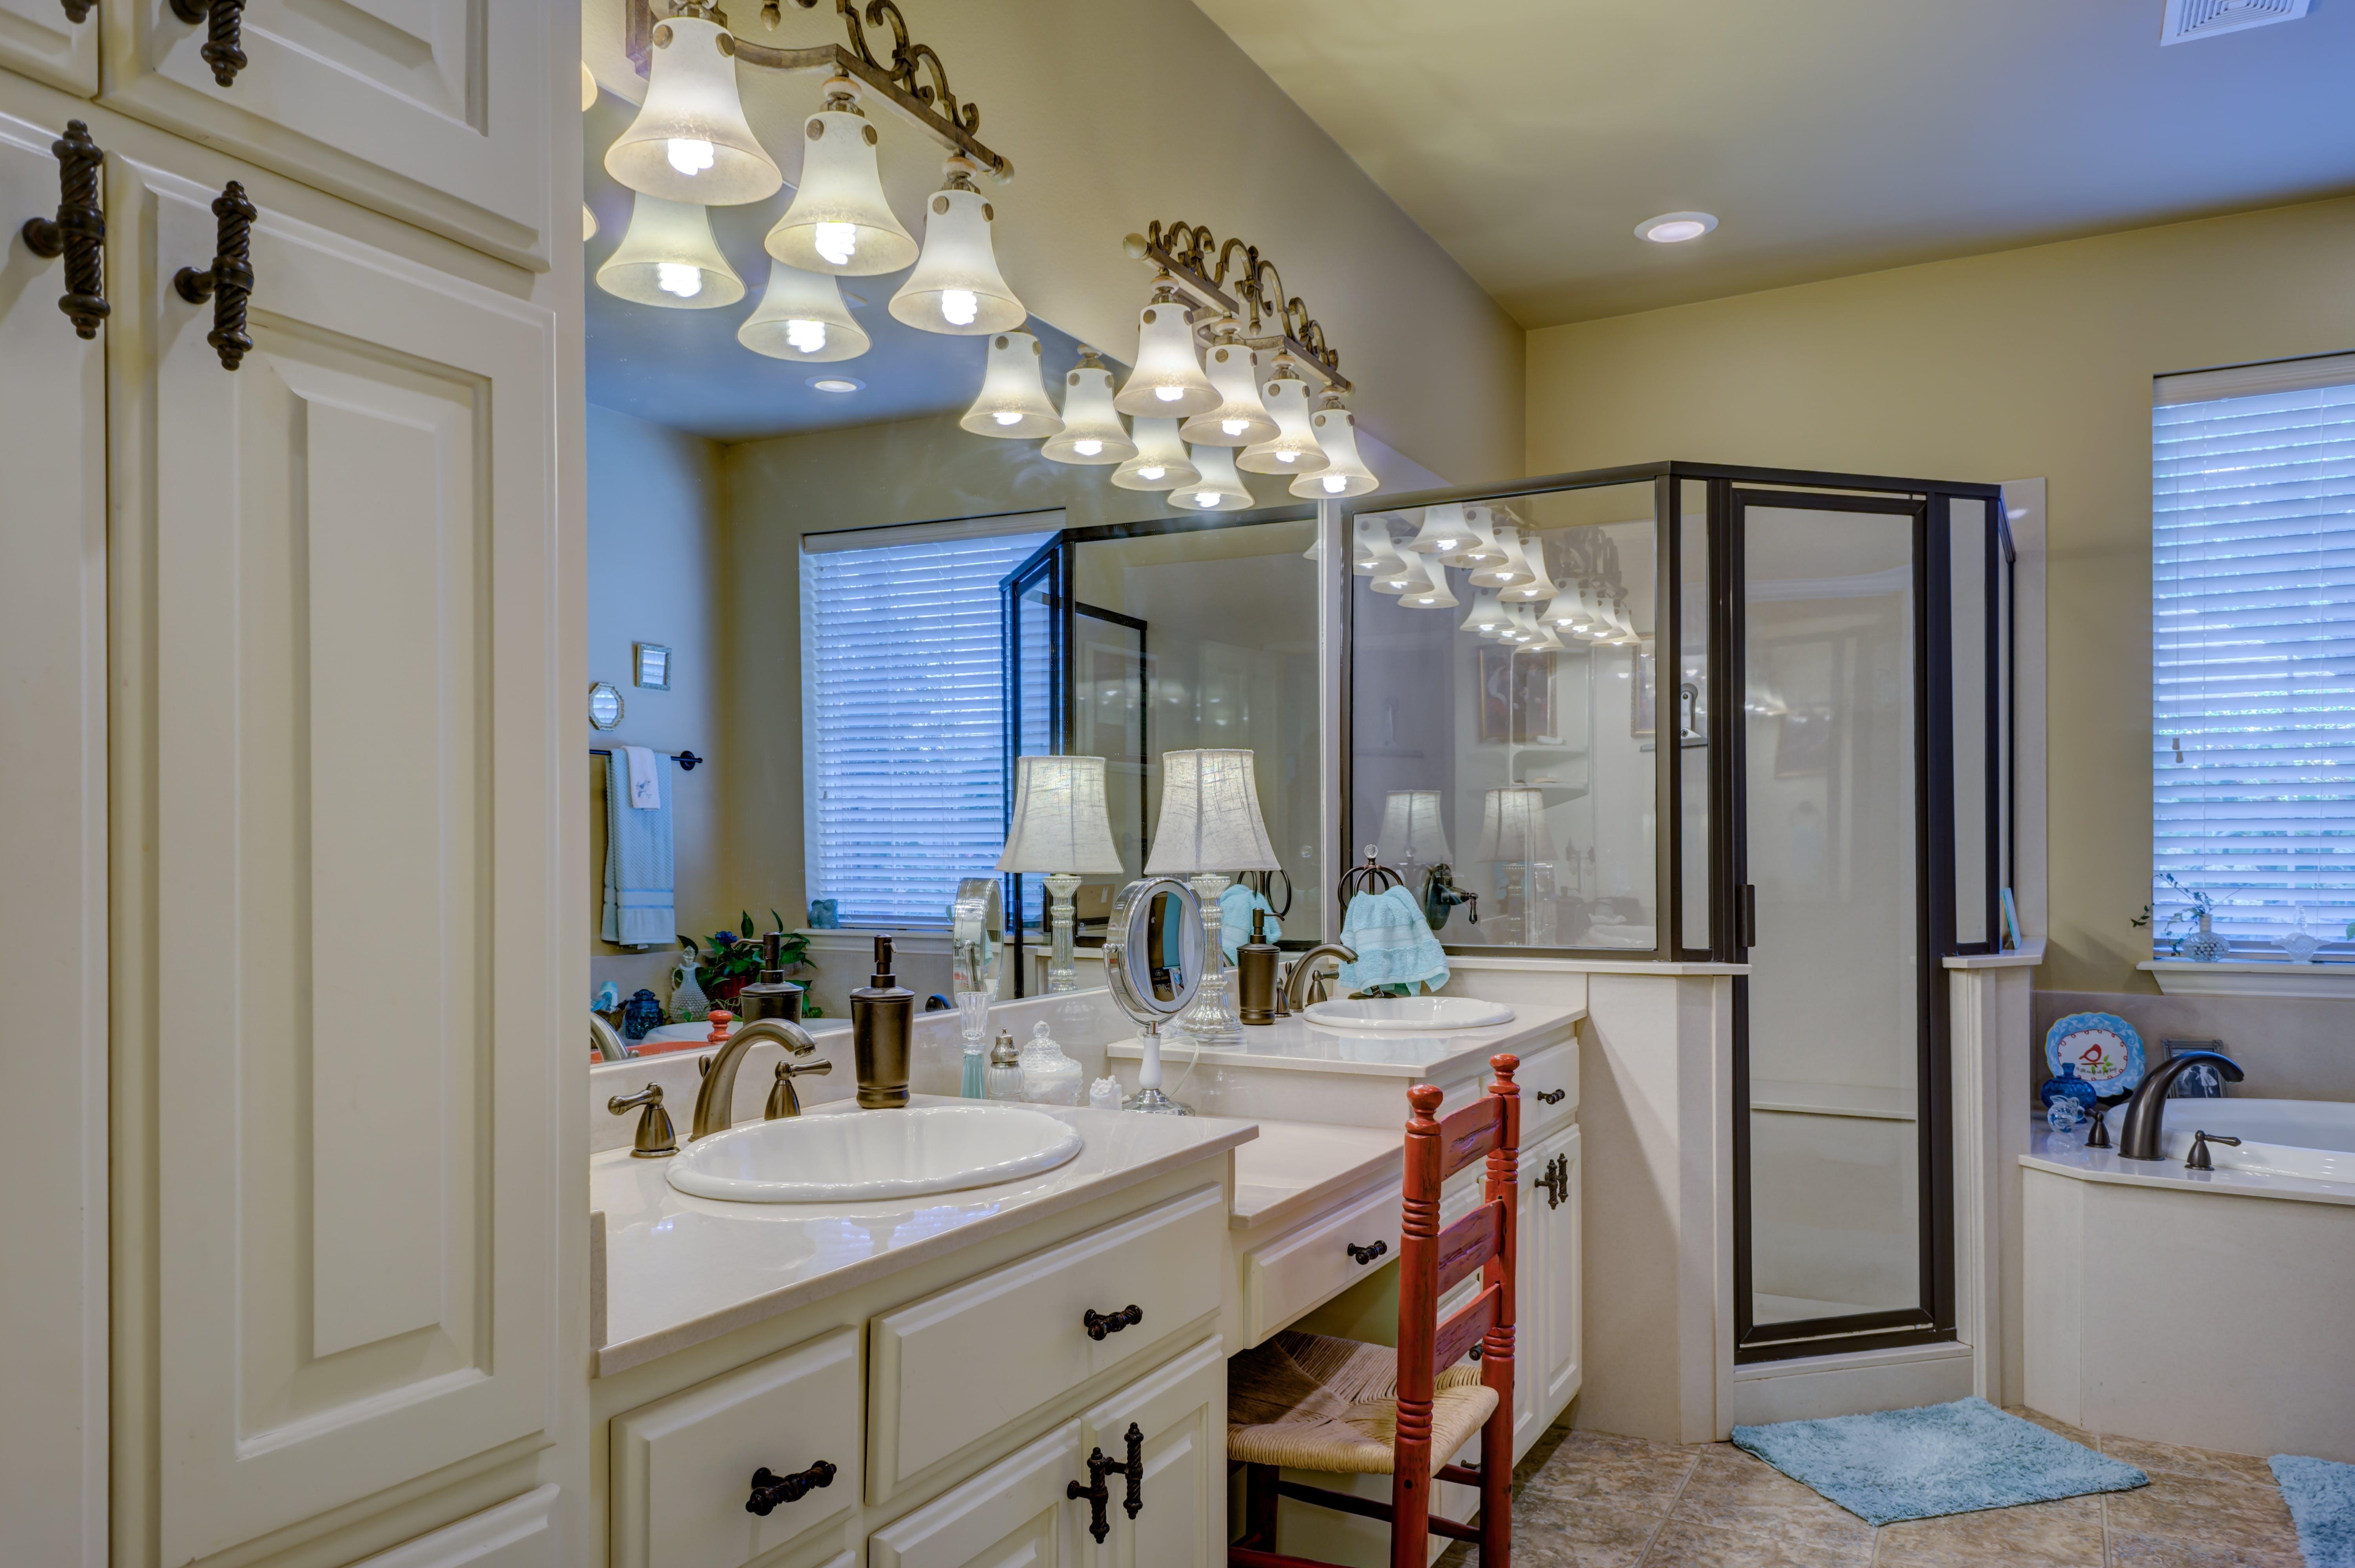 architecture, bathroom, bathroom interior